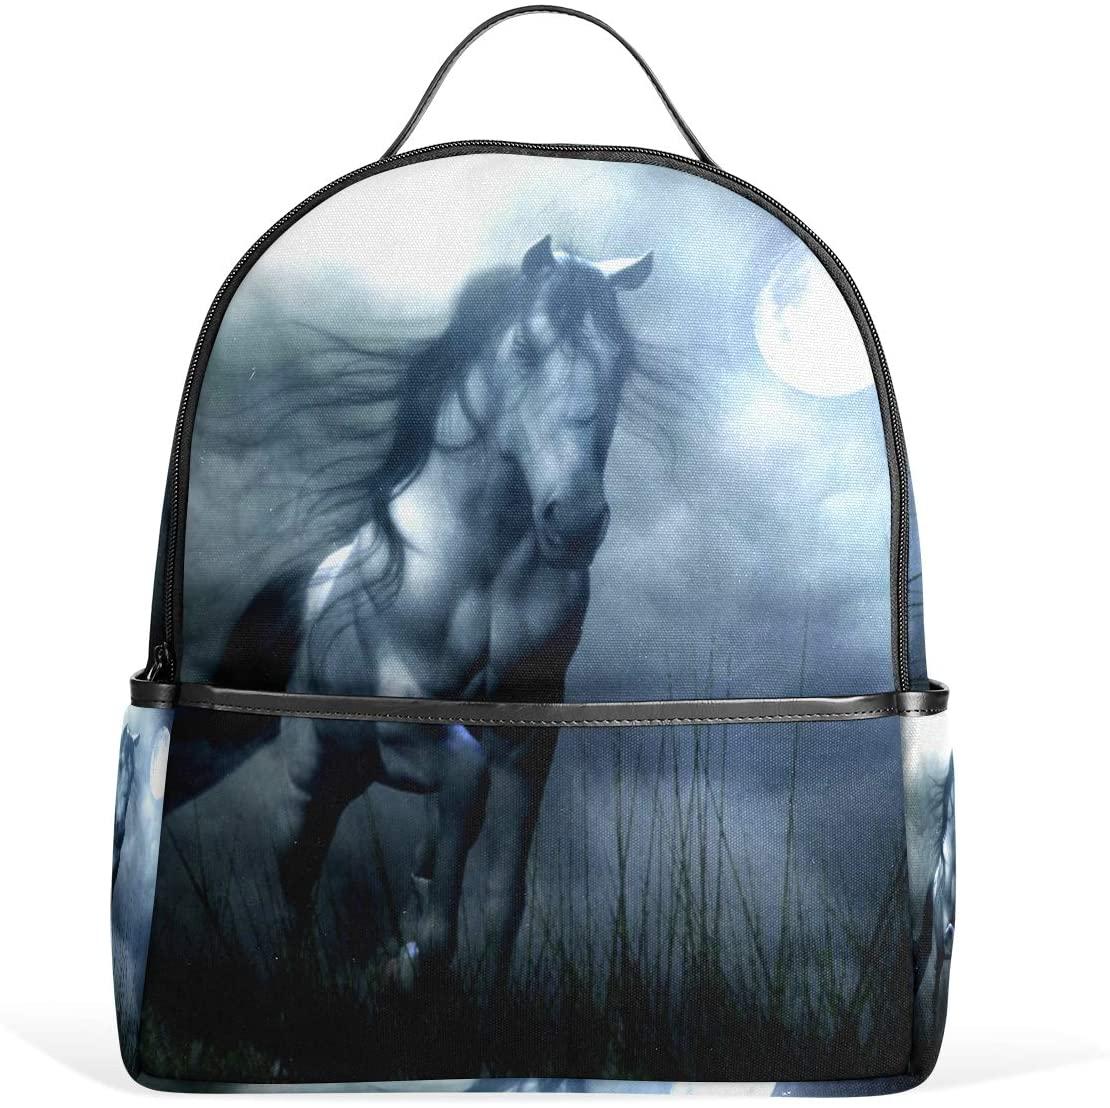 OREZI Schoolbag Bookbag Casual Travel Bag Rucksack Backpack for Girls Boys Teens Kid's White Horse In Moon Travel School Bags